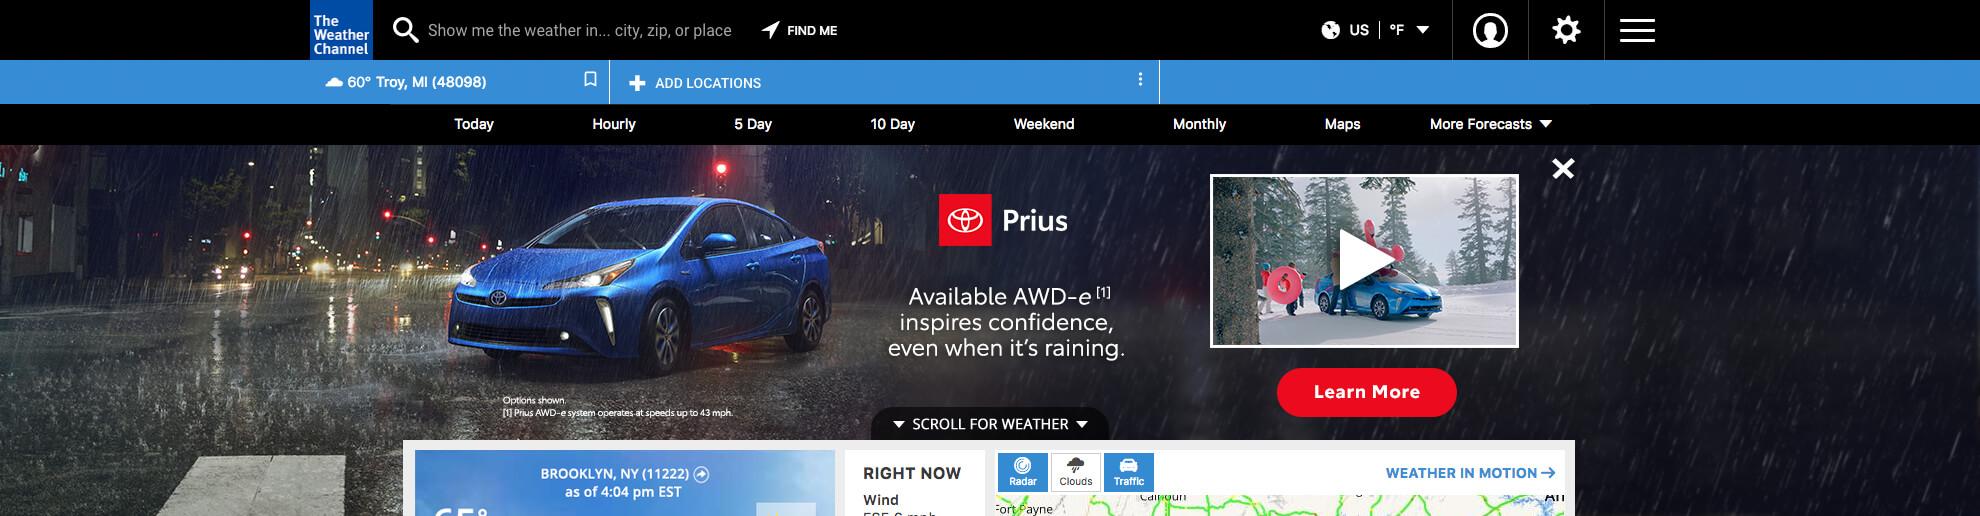 ToyotaPrius_DWB_0010_Rainy Night Open